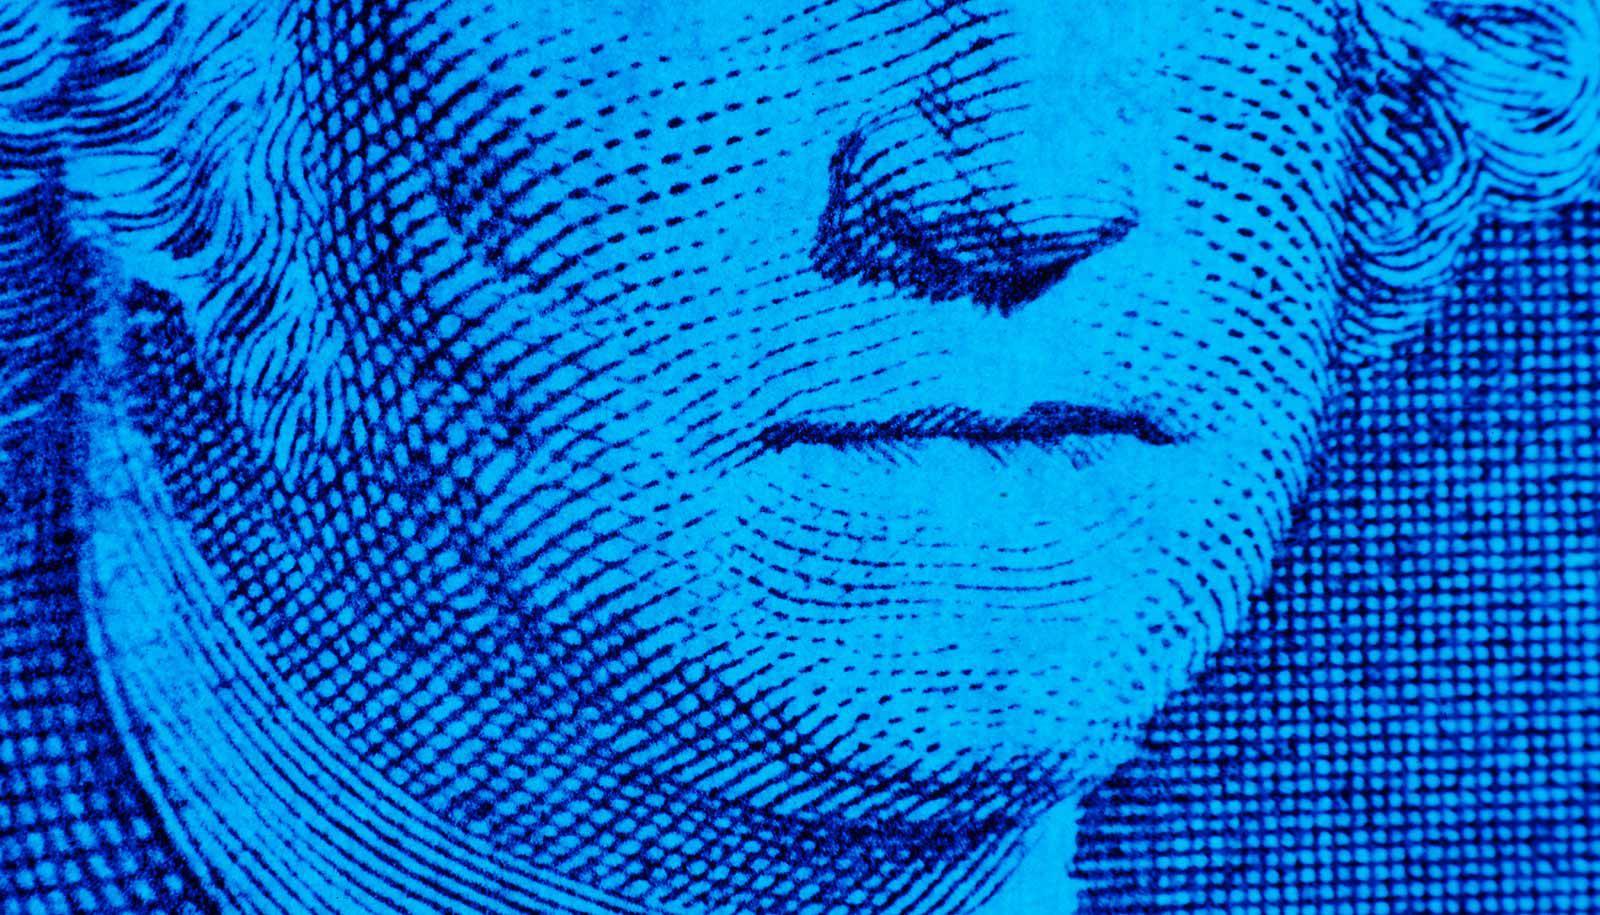 Washington's closed mouth on dollar bill -- blue filter